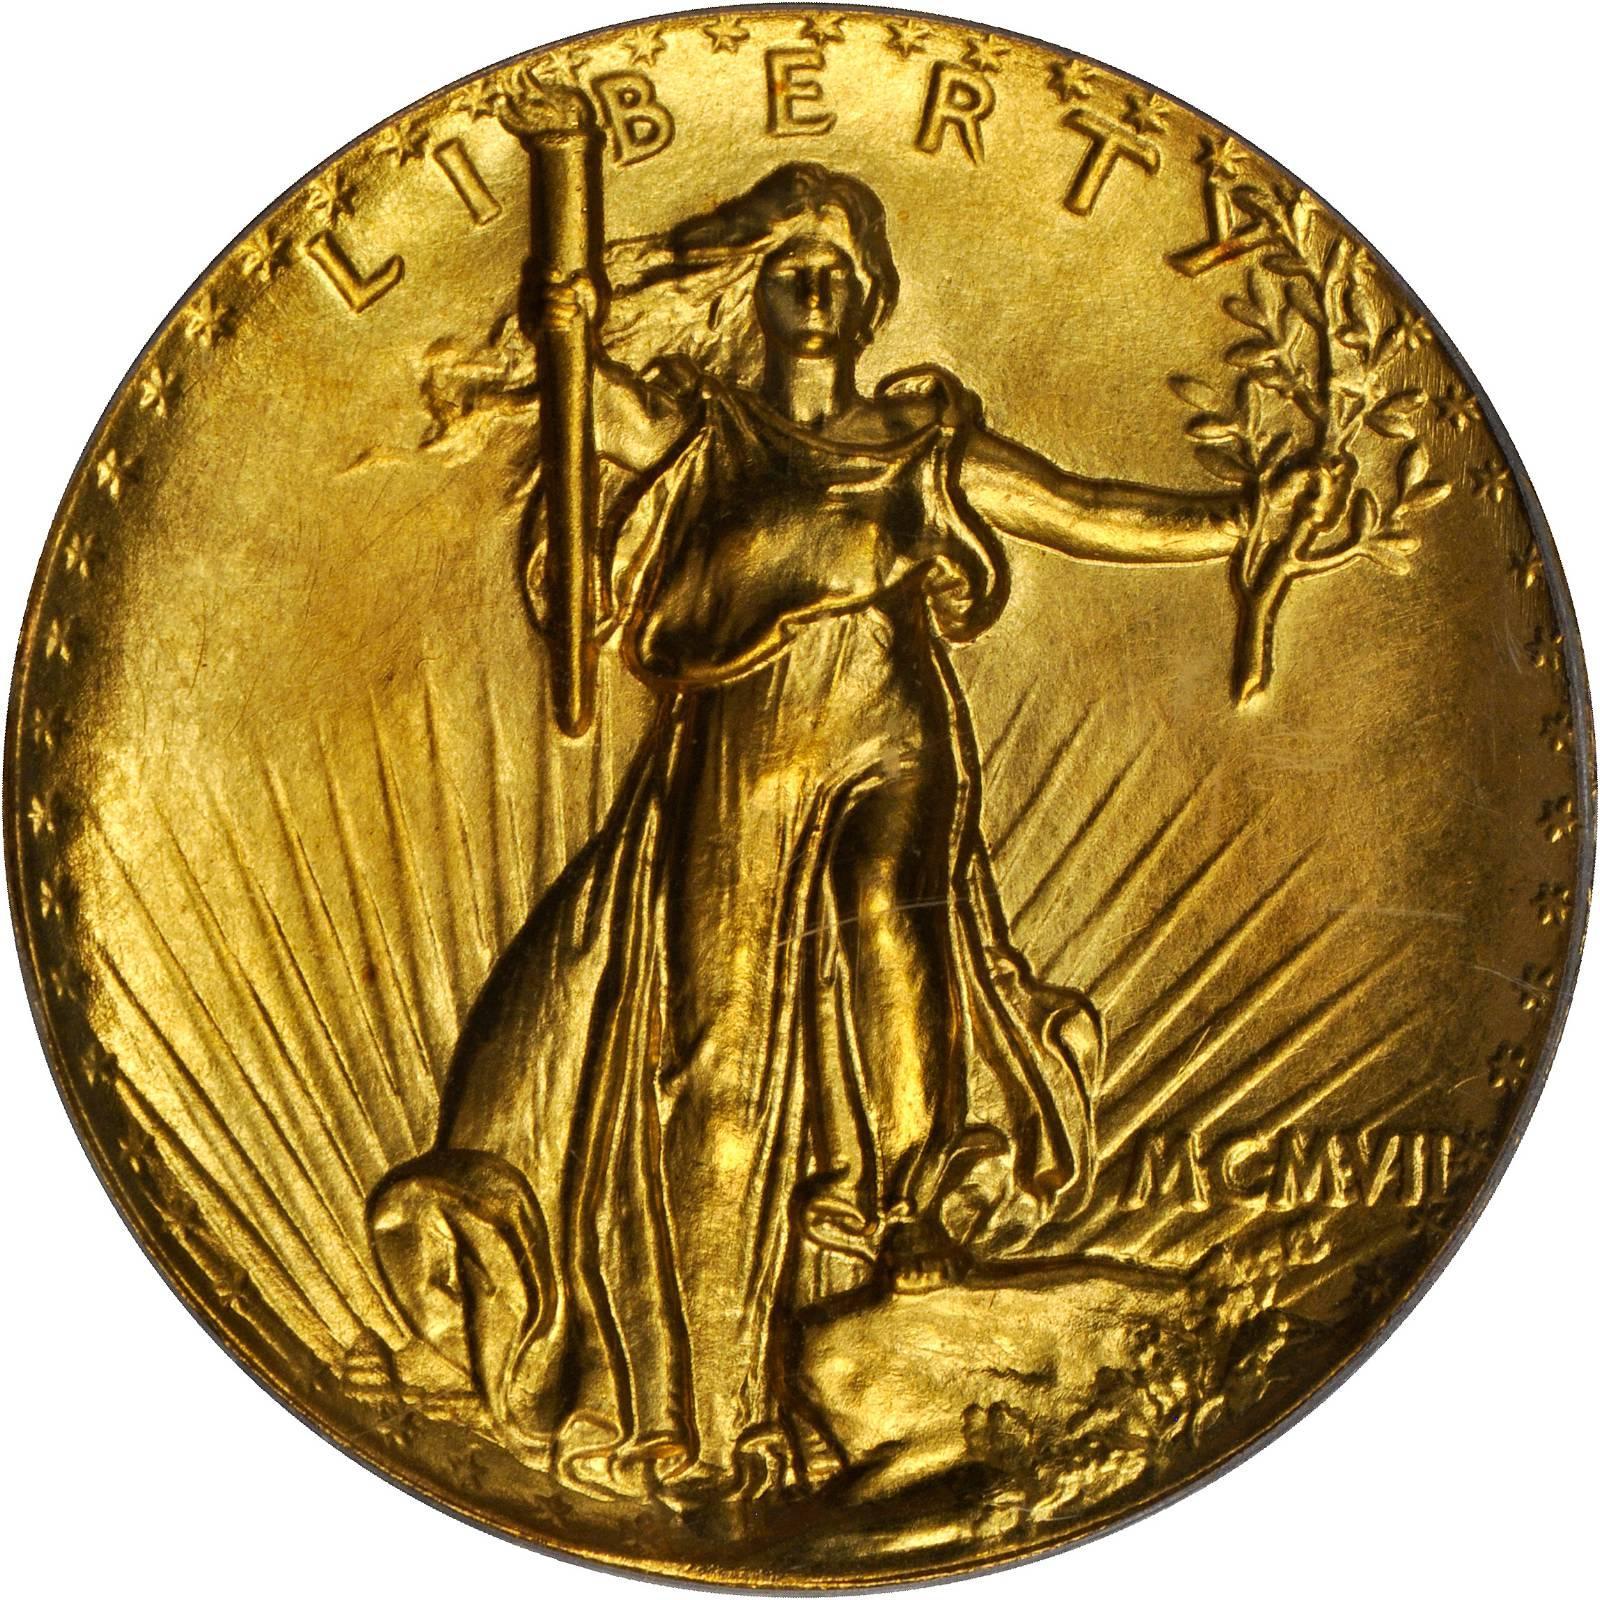 MCMVII (1907) Saint-Gaudens Double Eagle  Ultra High Relief